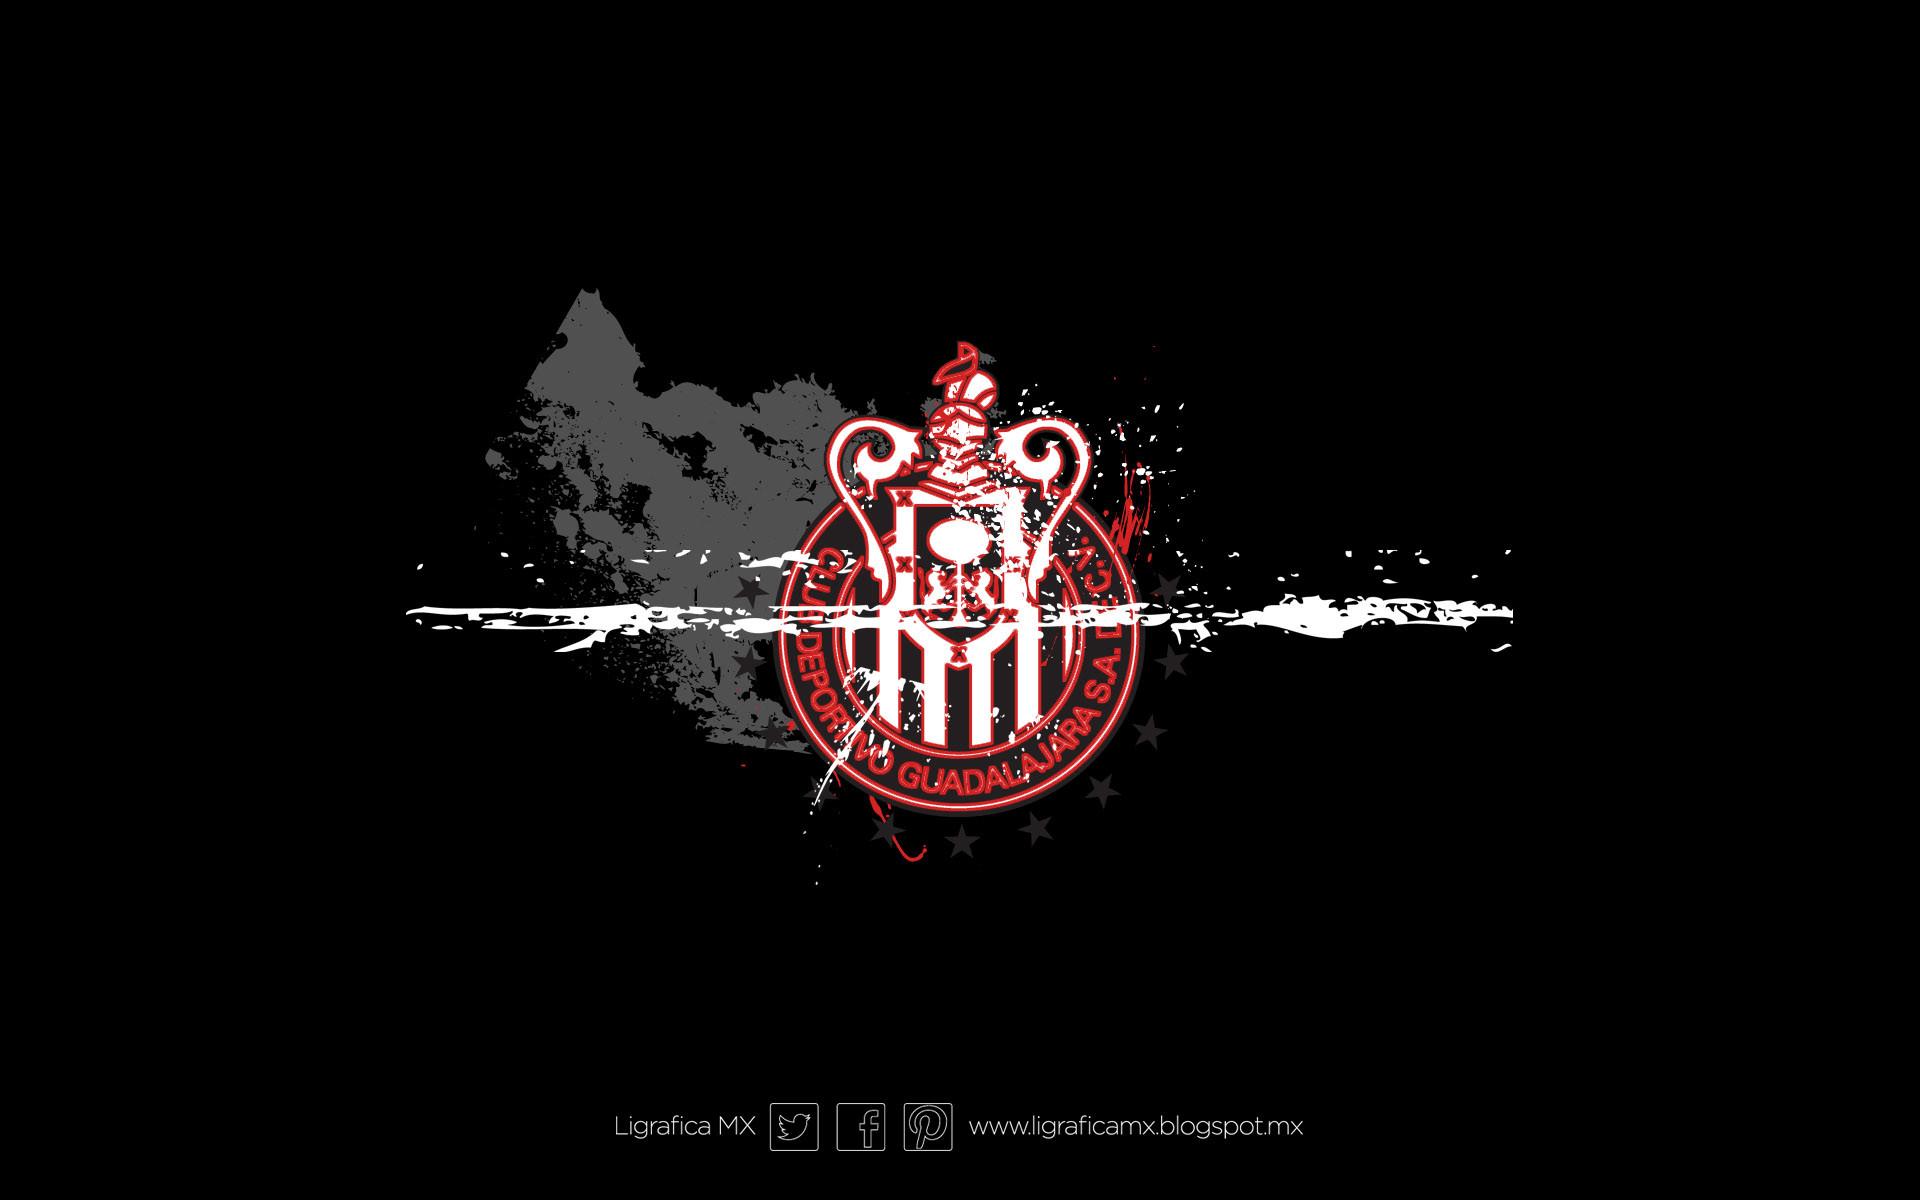 #Wallpaper Mod311013CTG(1) #LigraficaMX #DiseñoYFútbol #ElFútbolNosInspira  • #Chivas